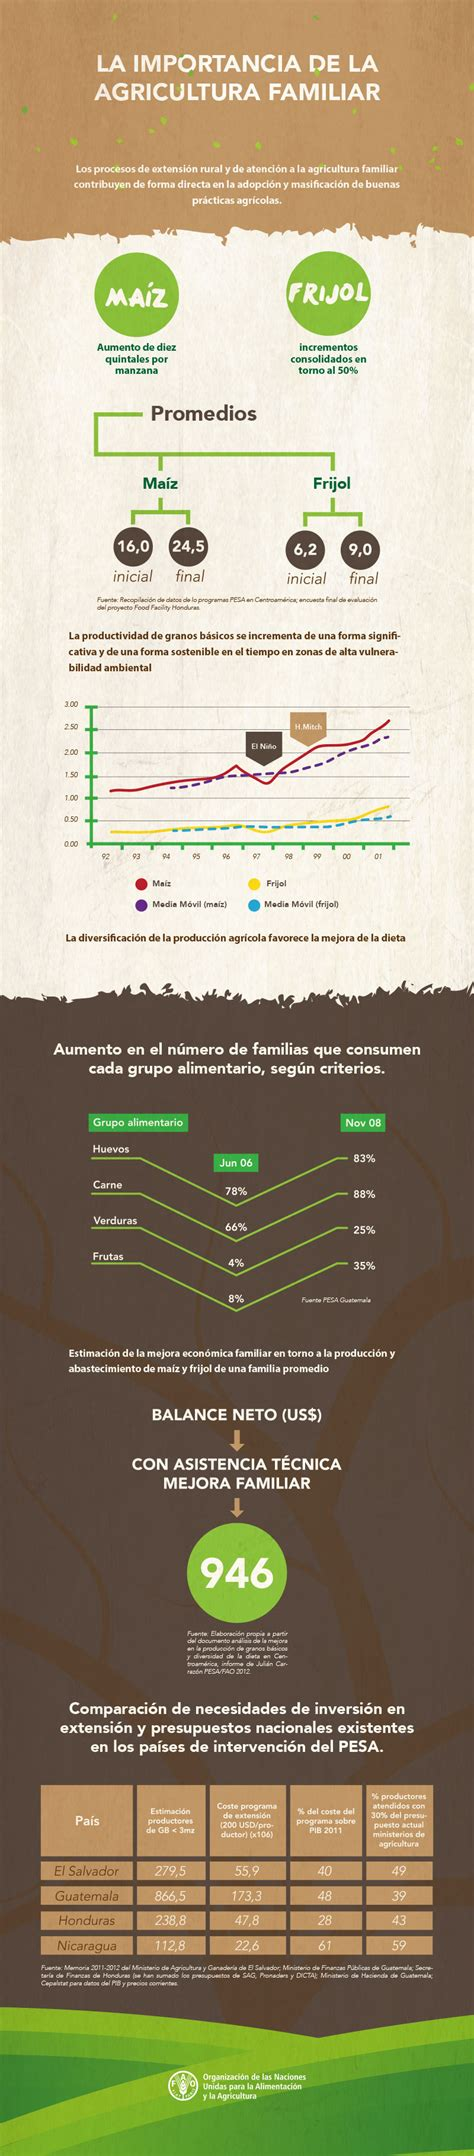 La Importancia de la Agricultura Familiar